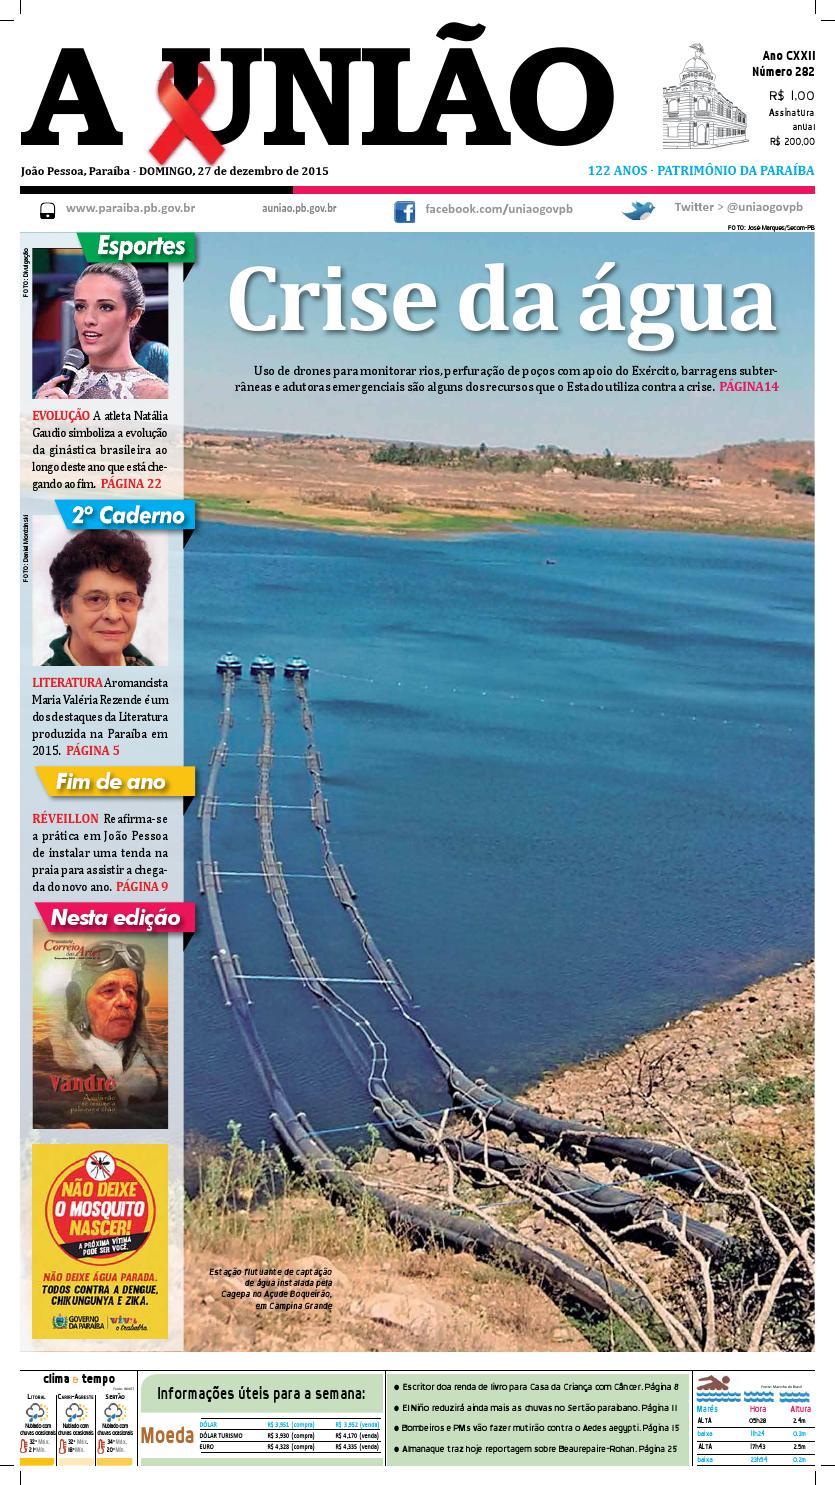 Jornal A União - 27 12 2015 by Jornal A União - issuu 08635929a11